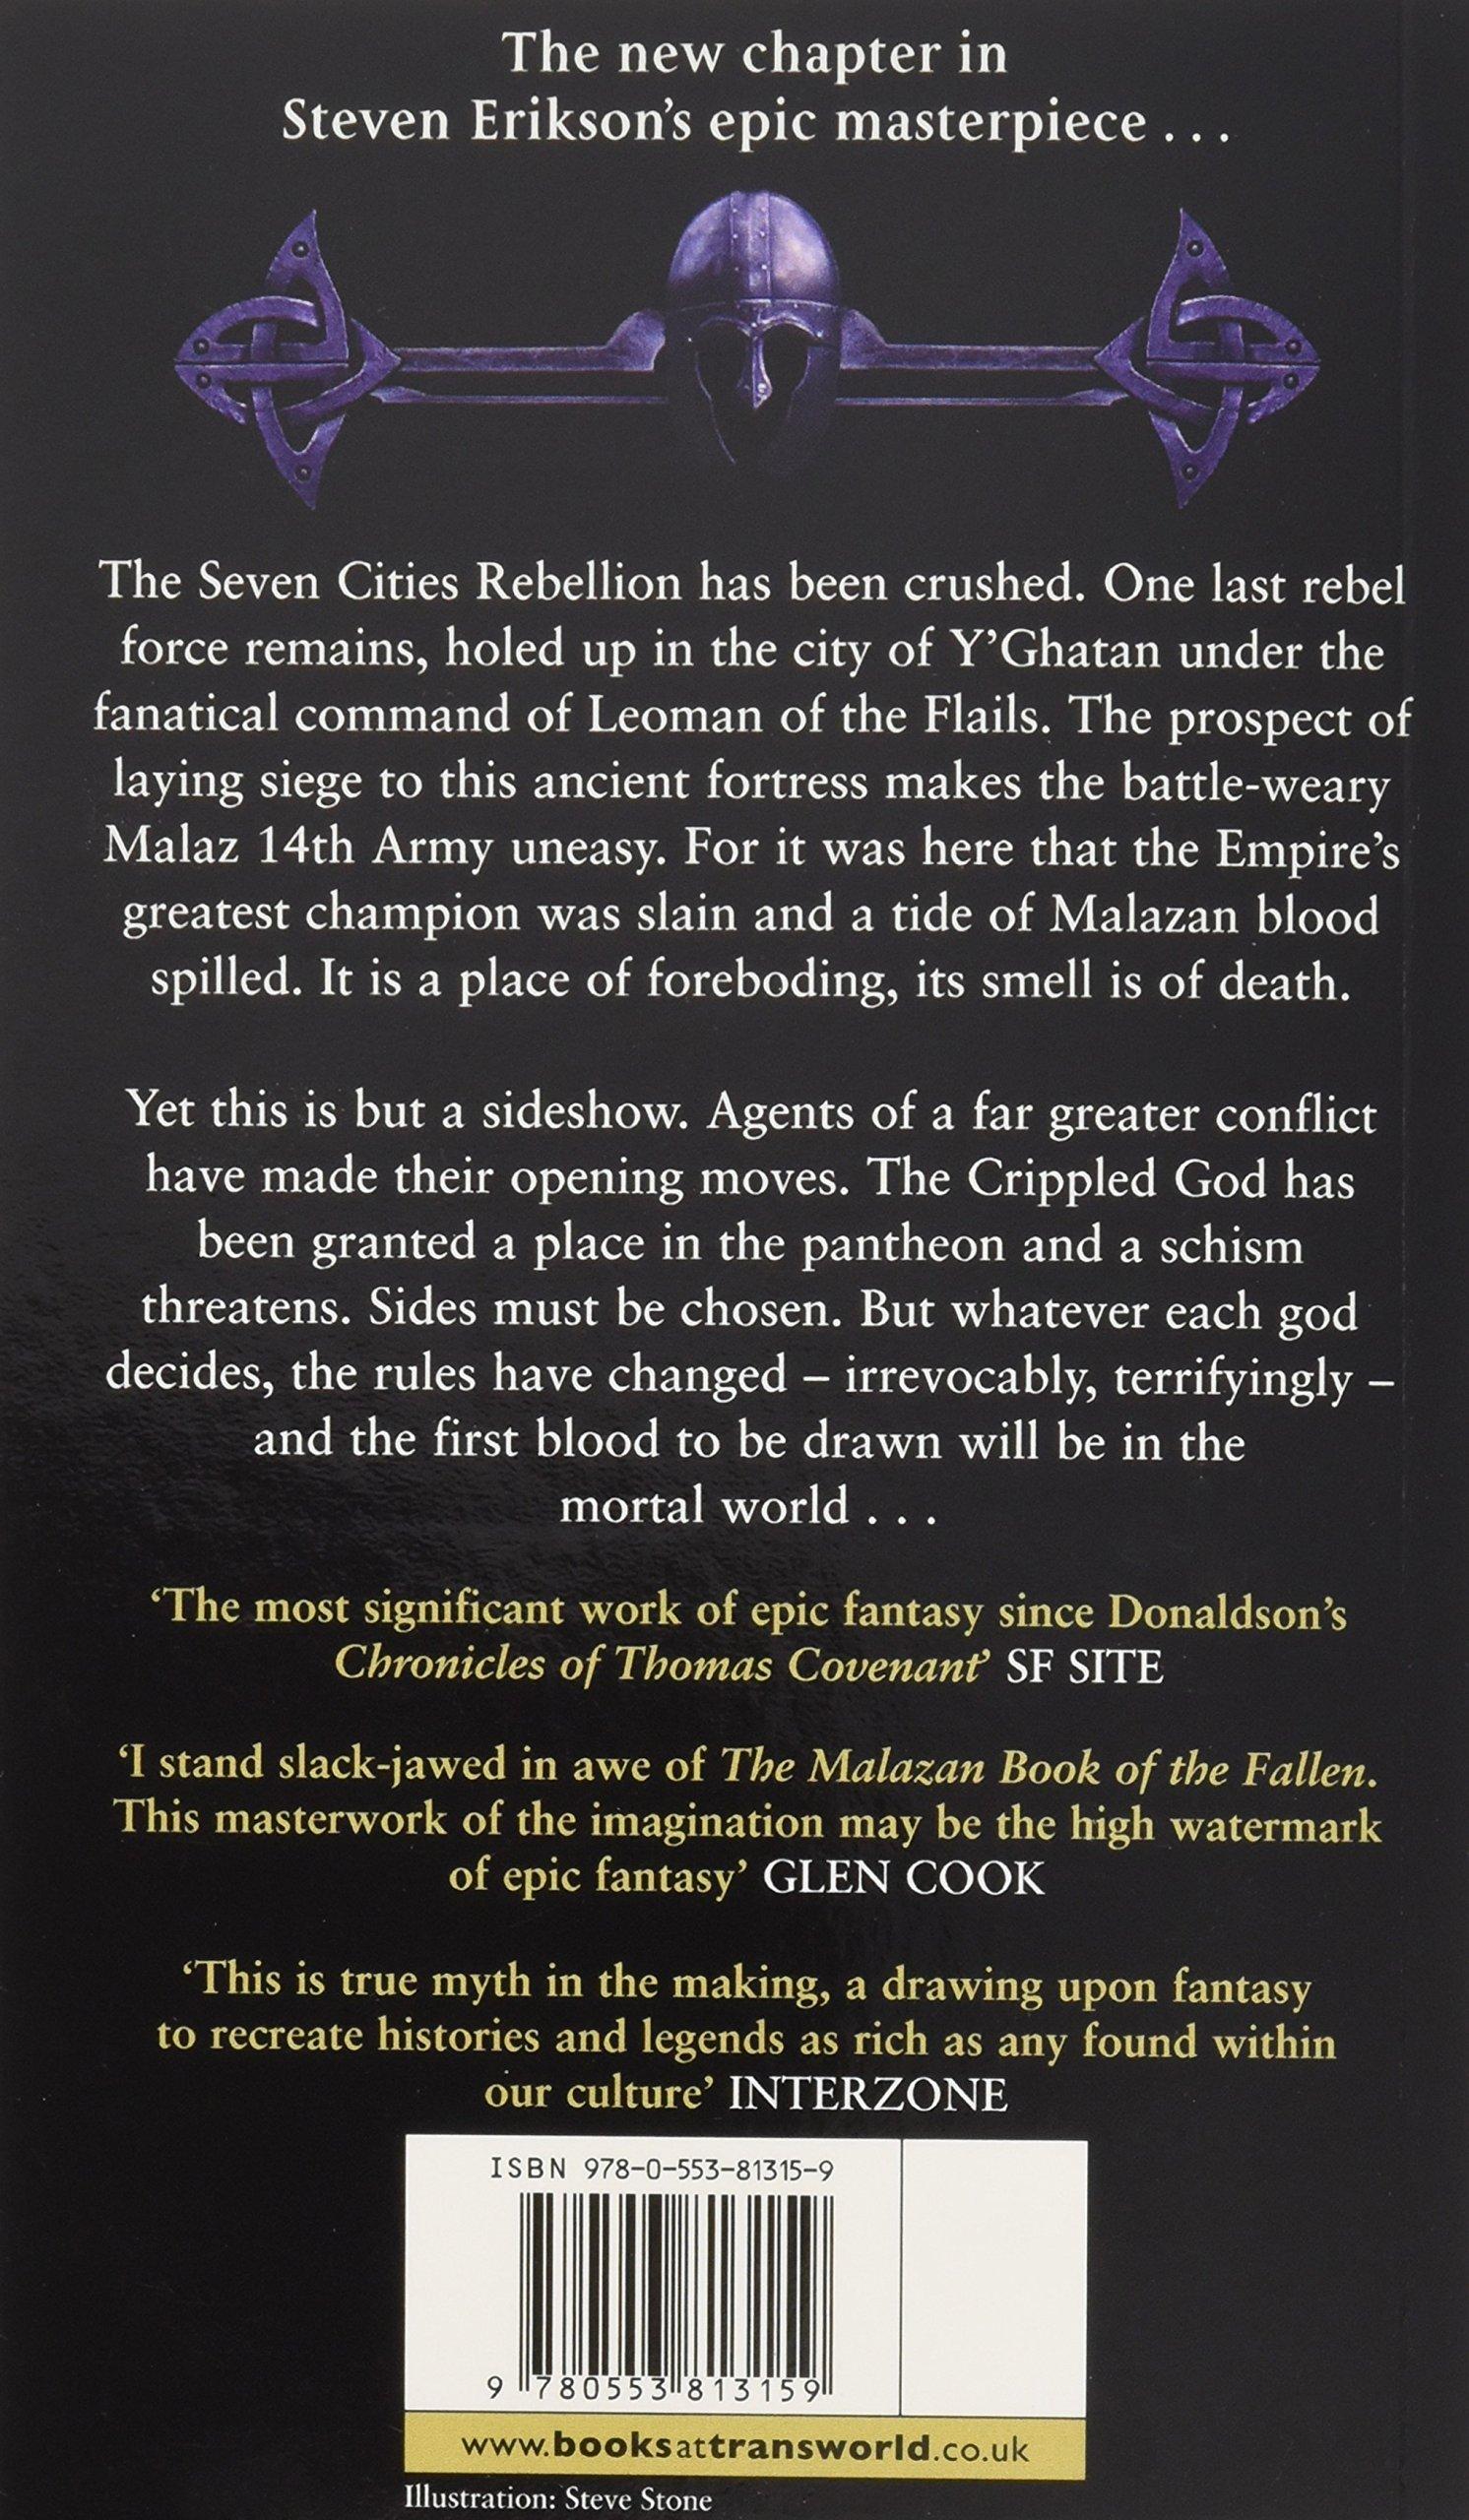 Buy The Bonehunters: Malazan Book Of Fallen 6 (the Malazan Book Of The  Fallen) Book Online At Low Prices In India  The Bonehunters: Malazan Book  Of Fallen